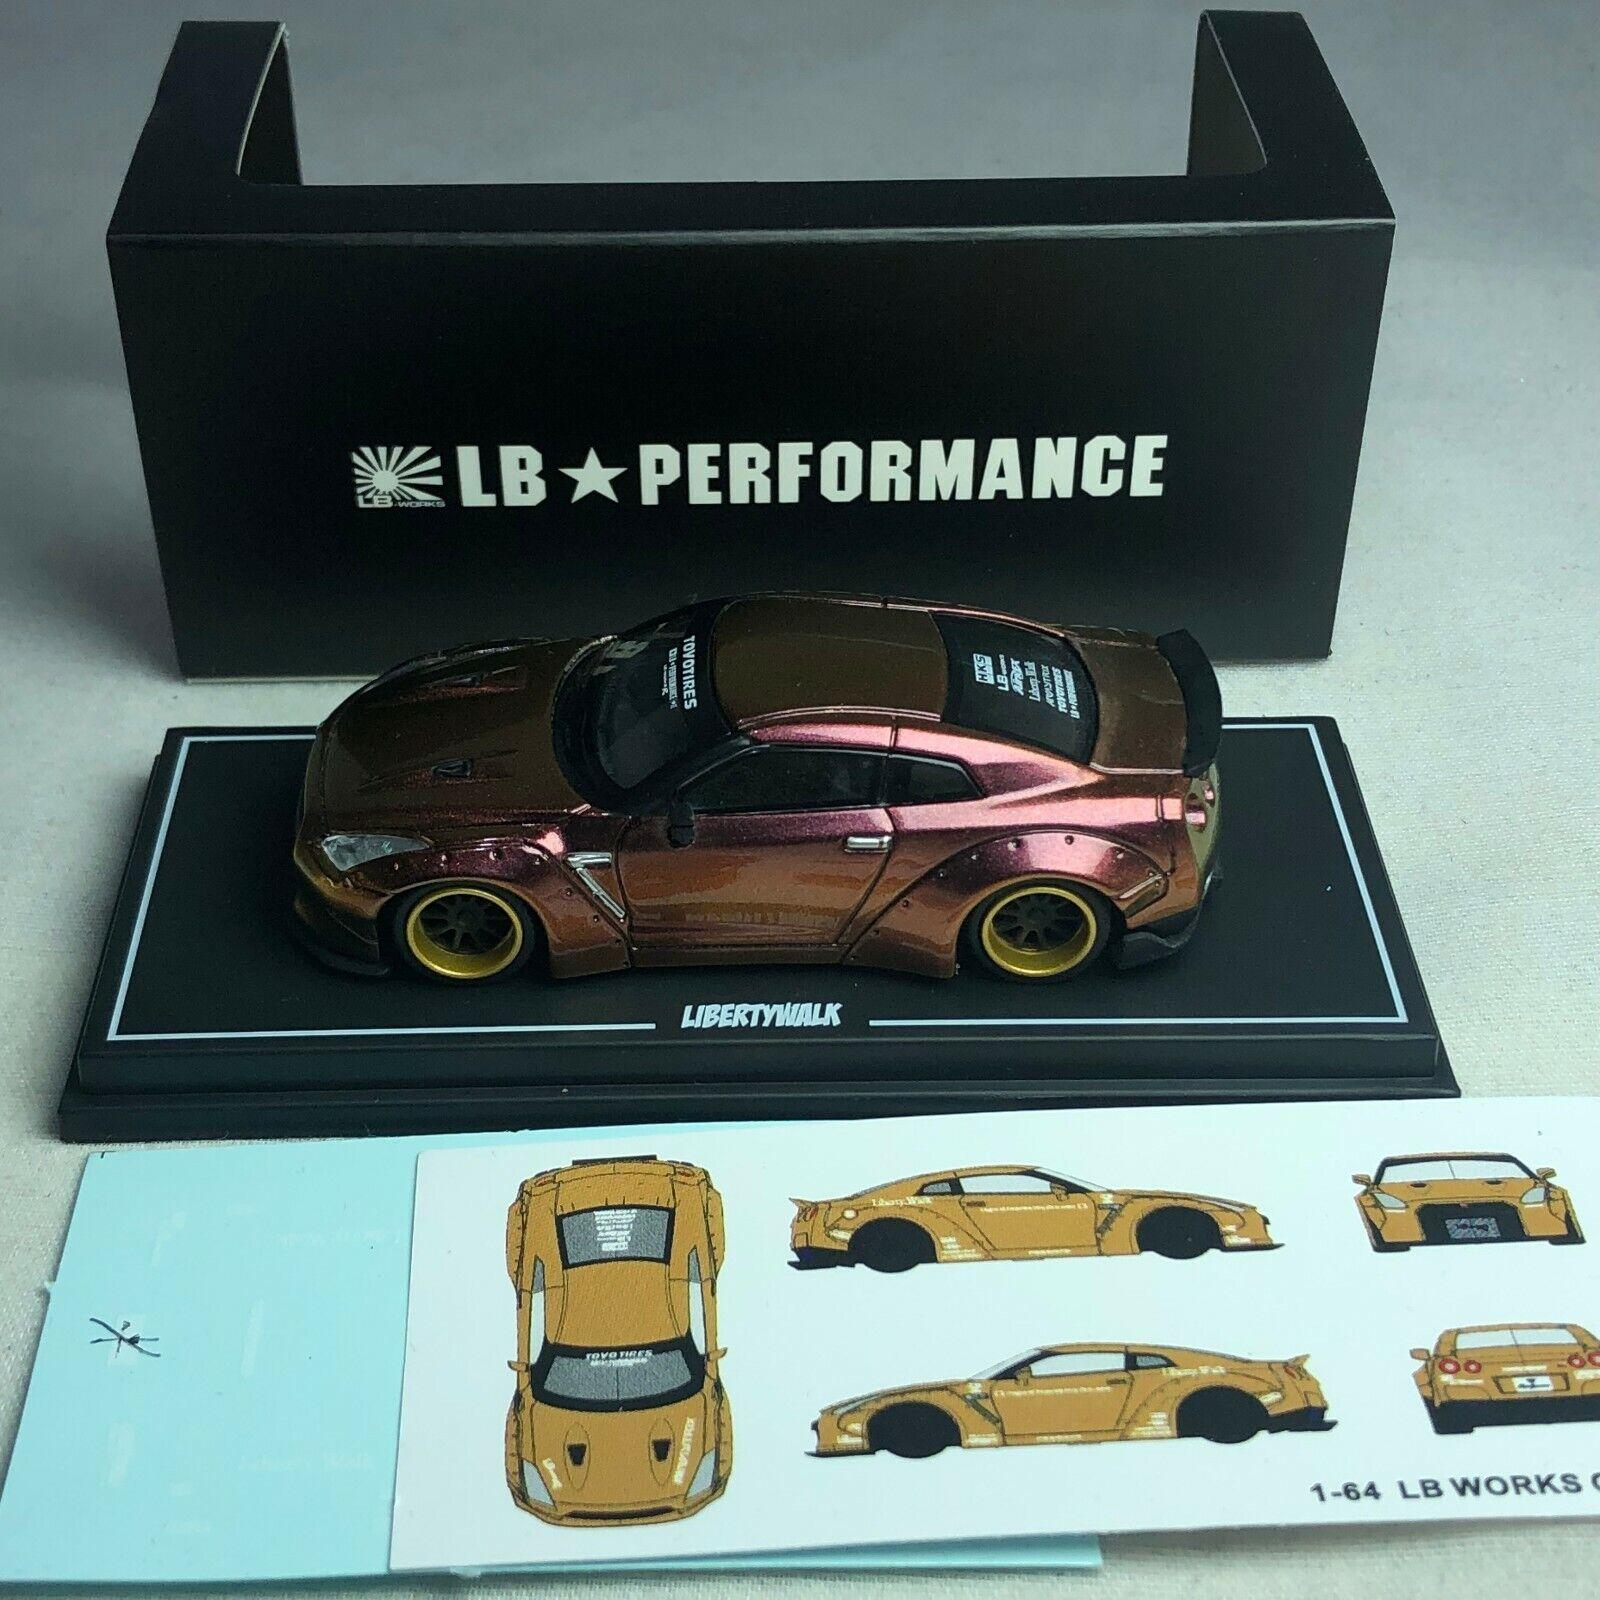 1/64 LB Works Liberty Walk Nissan GTR R35 Chameleon Gold Duc